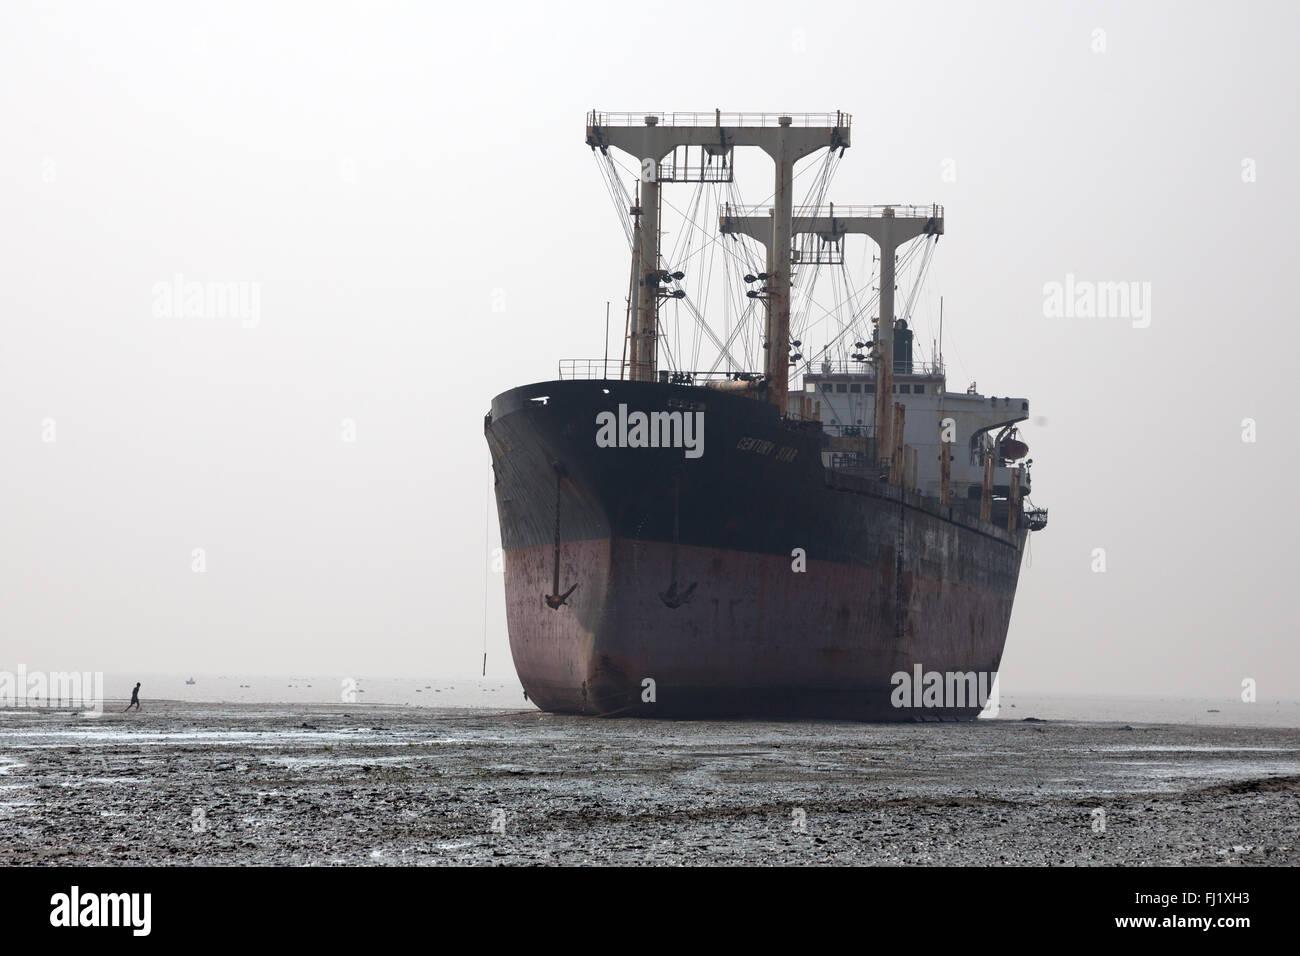 Astillero de desguace de buques en Chittagong, Bangladesh Imagen De Stock